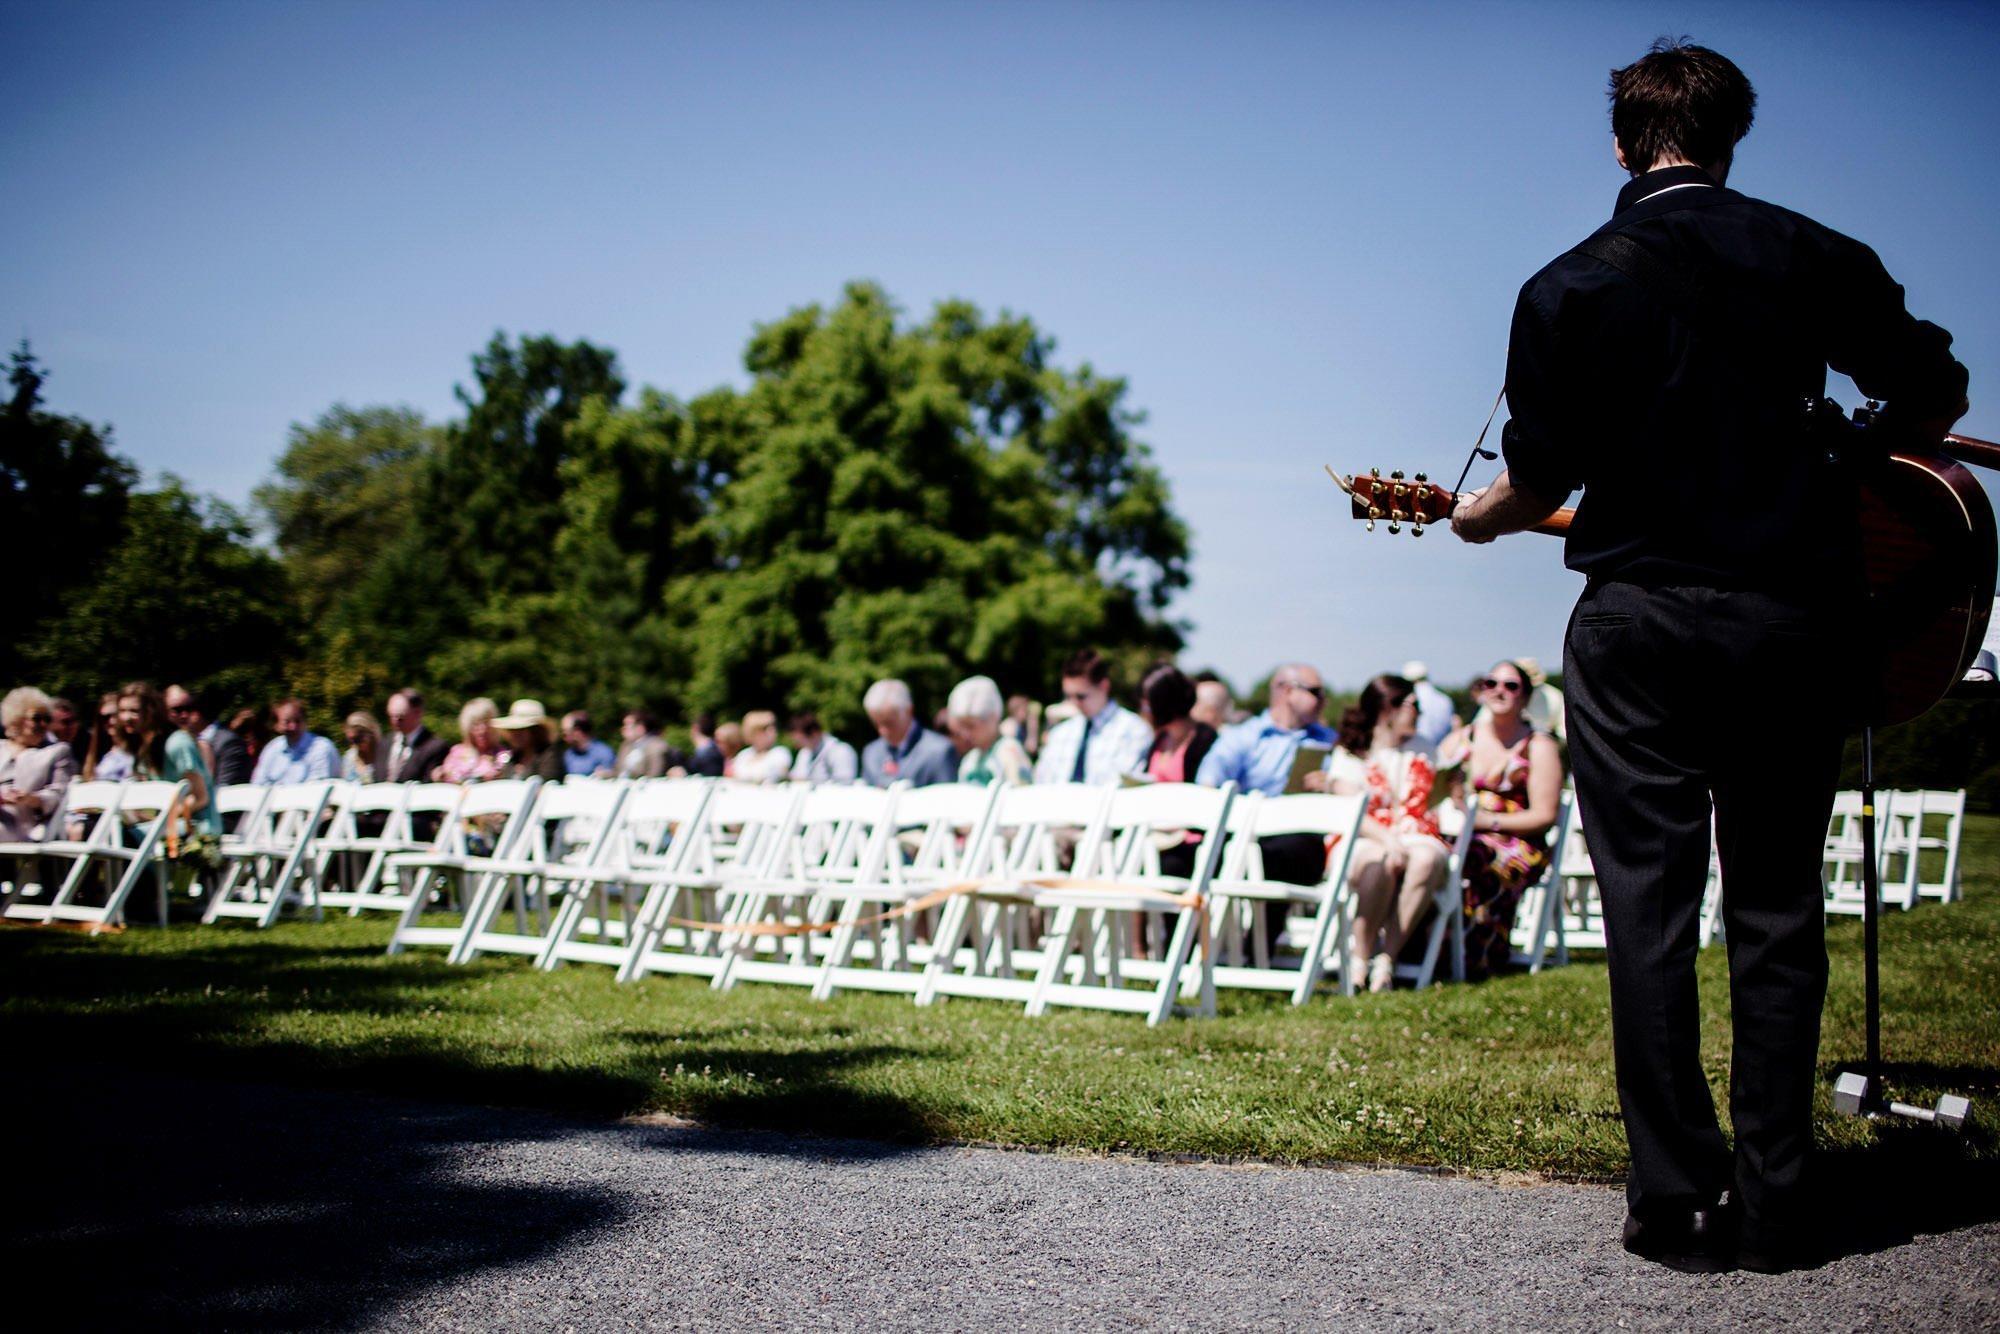 A musician plays the guitar during the River Farm Alexandria Wedding ceremony.